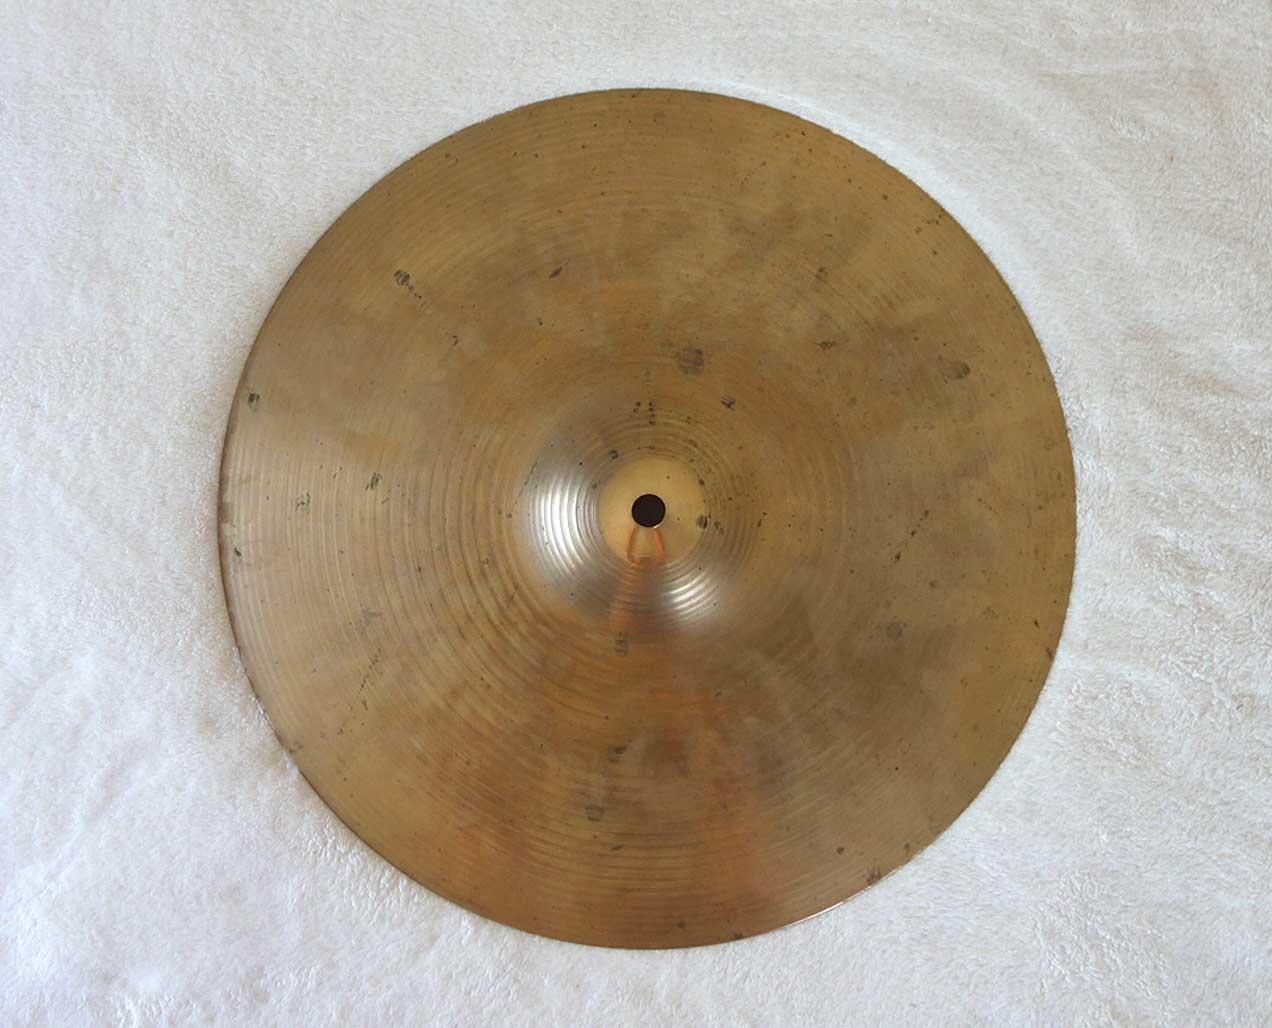 "K Zildjian K 14"" Hi-Hat Top, Weight: 1006g"